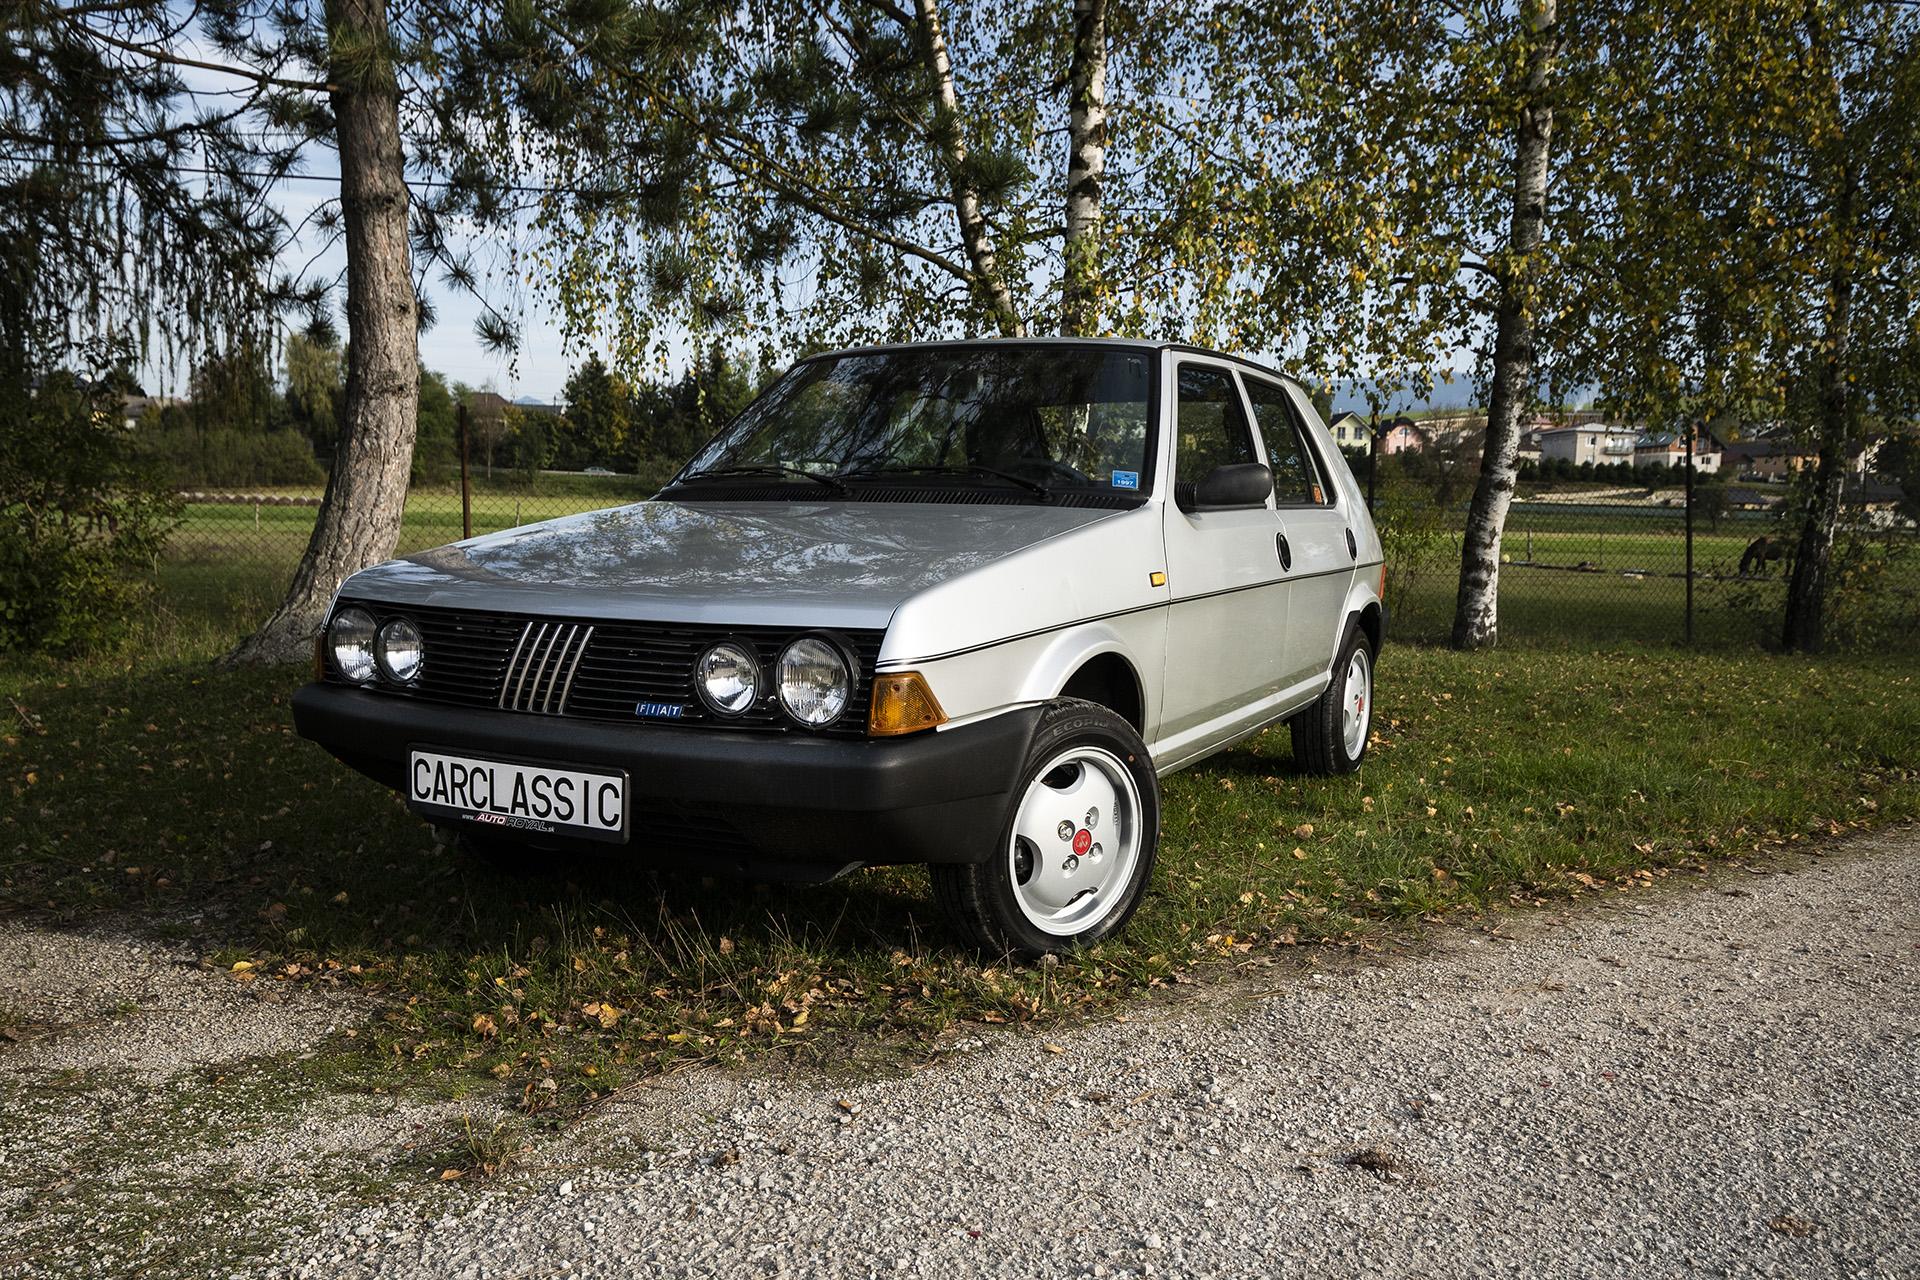 1984 Fiat Ritmo 60